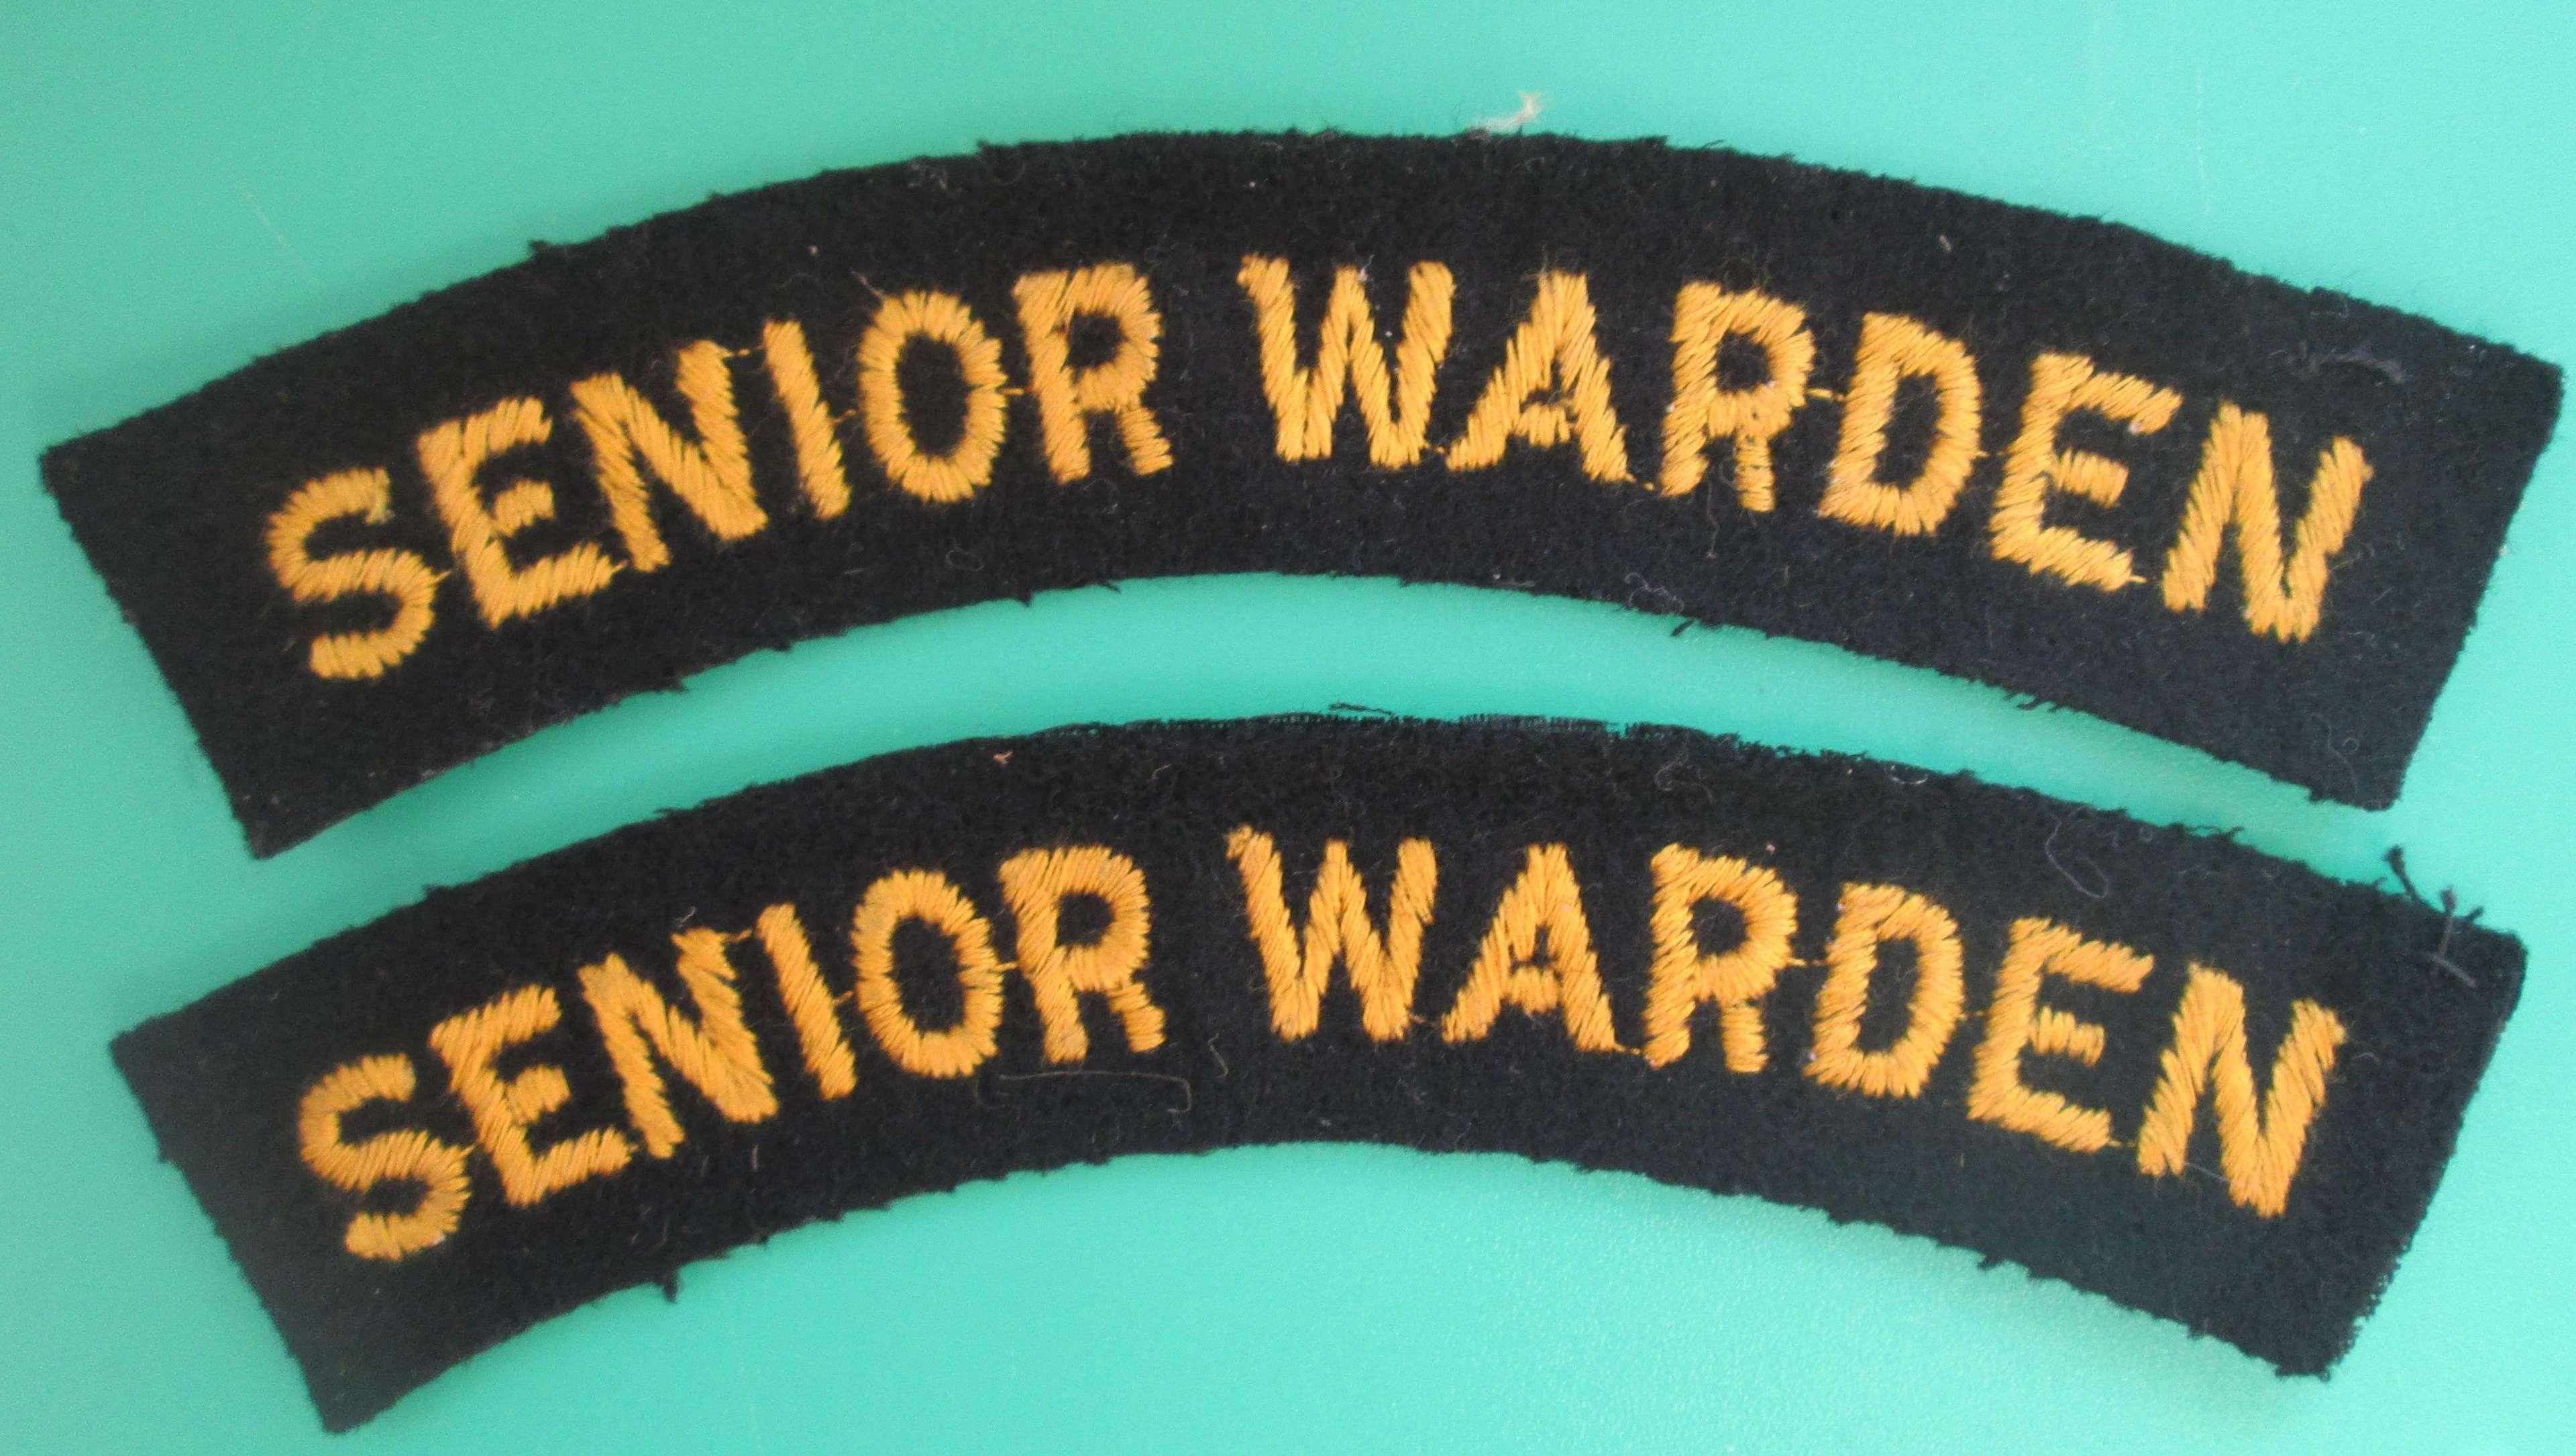 A PAIR OF SENIOR WARDENS SHOULDER TITLES